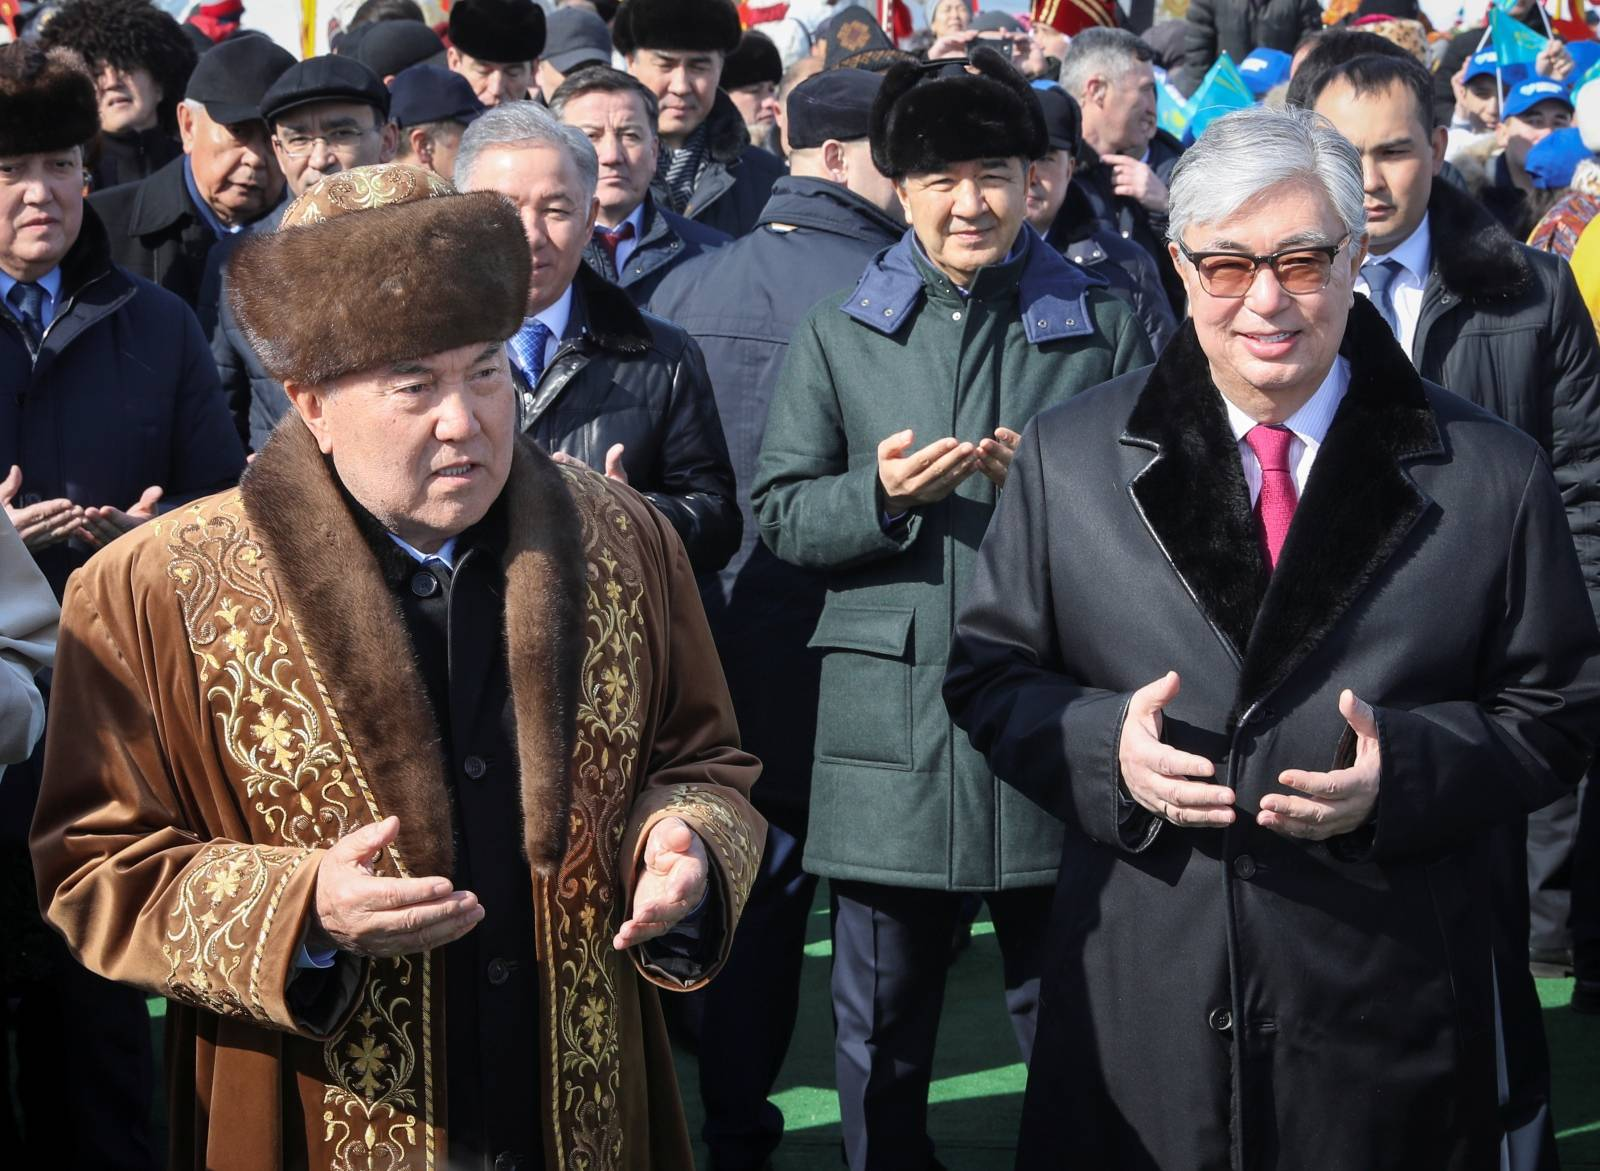 Former Kazakh President Nazarbayev and President Tokayev visit a fair of Navruz festival in Astana